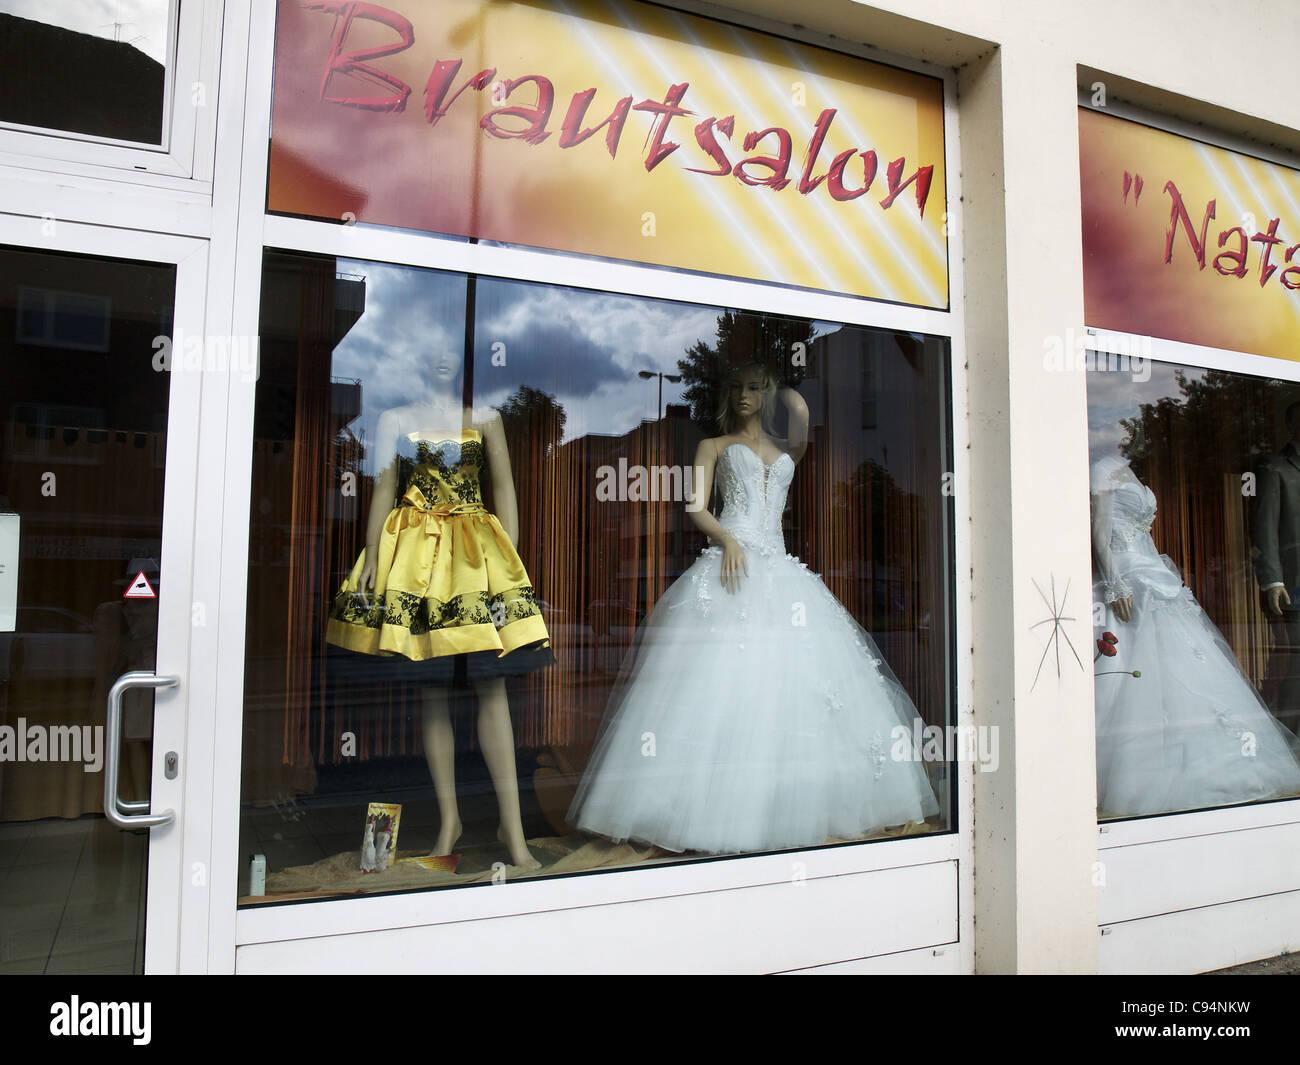 Bridal gawn in a shop window in Hamburg, Germany - Stock Image